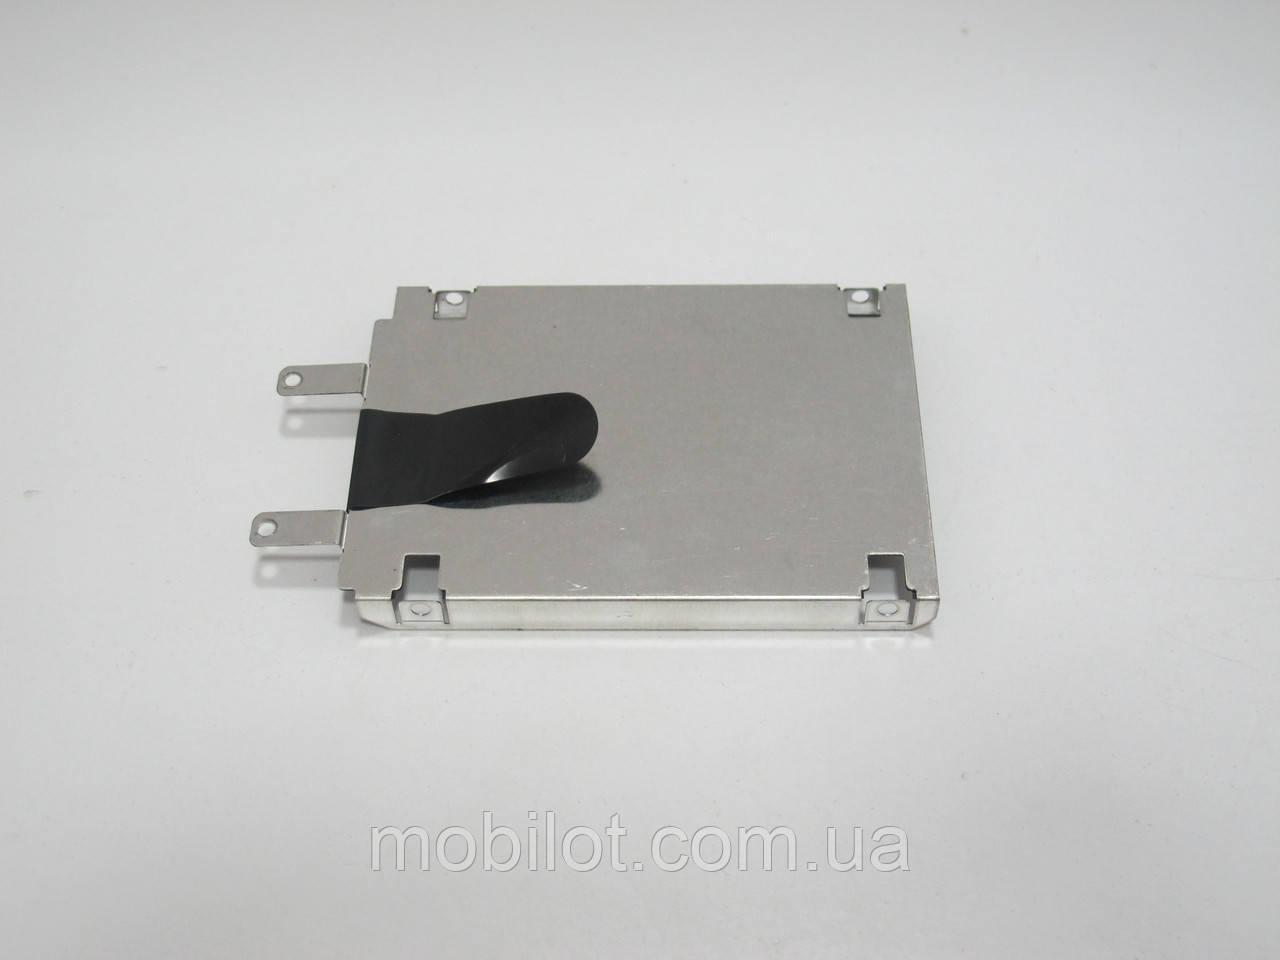 Корпус (карман, корзина, крепление) для HDD Gateway W350A (NZ-6156)